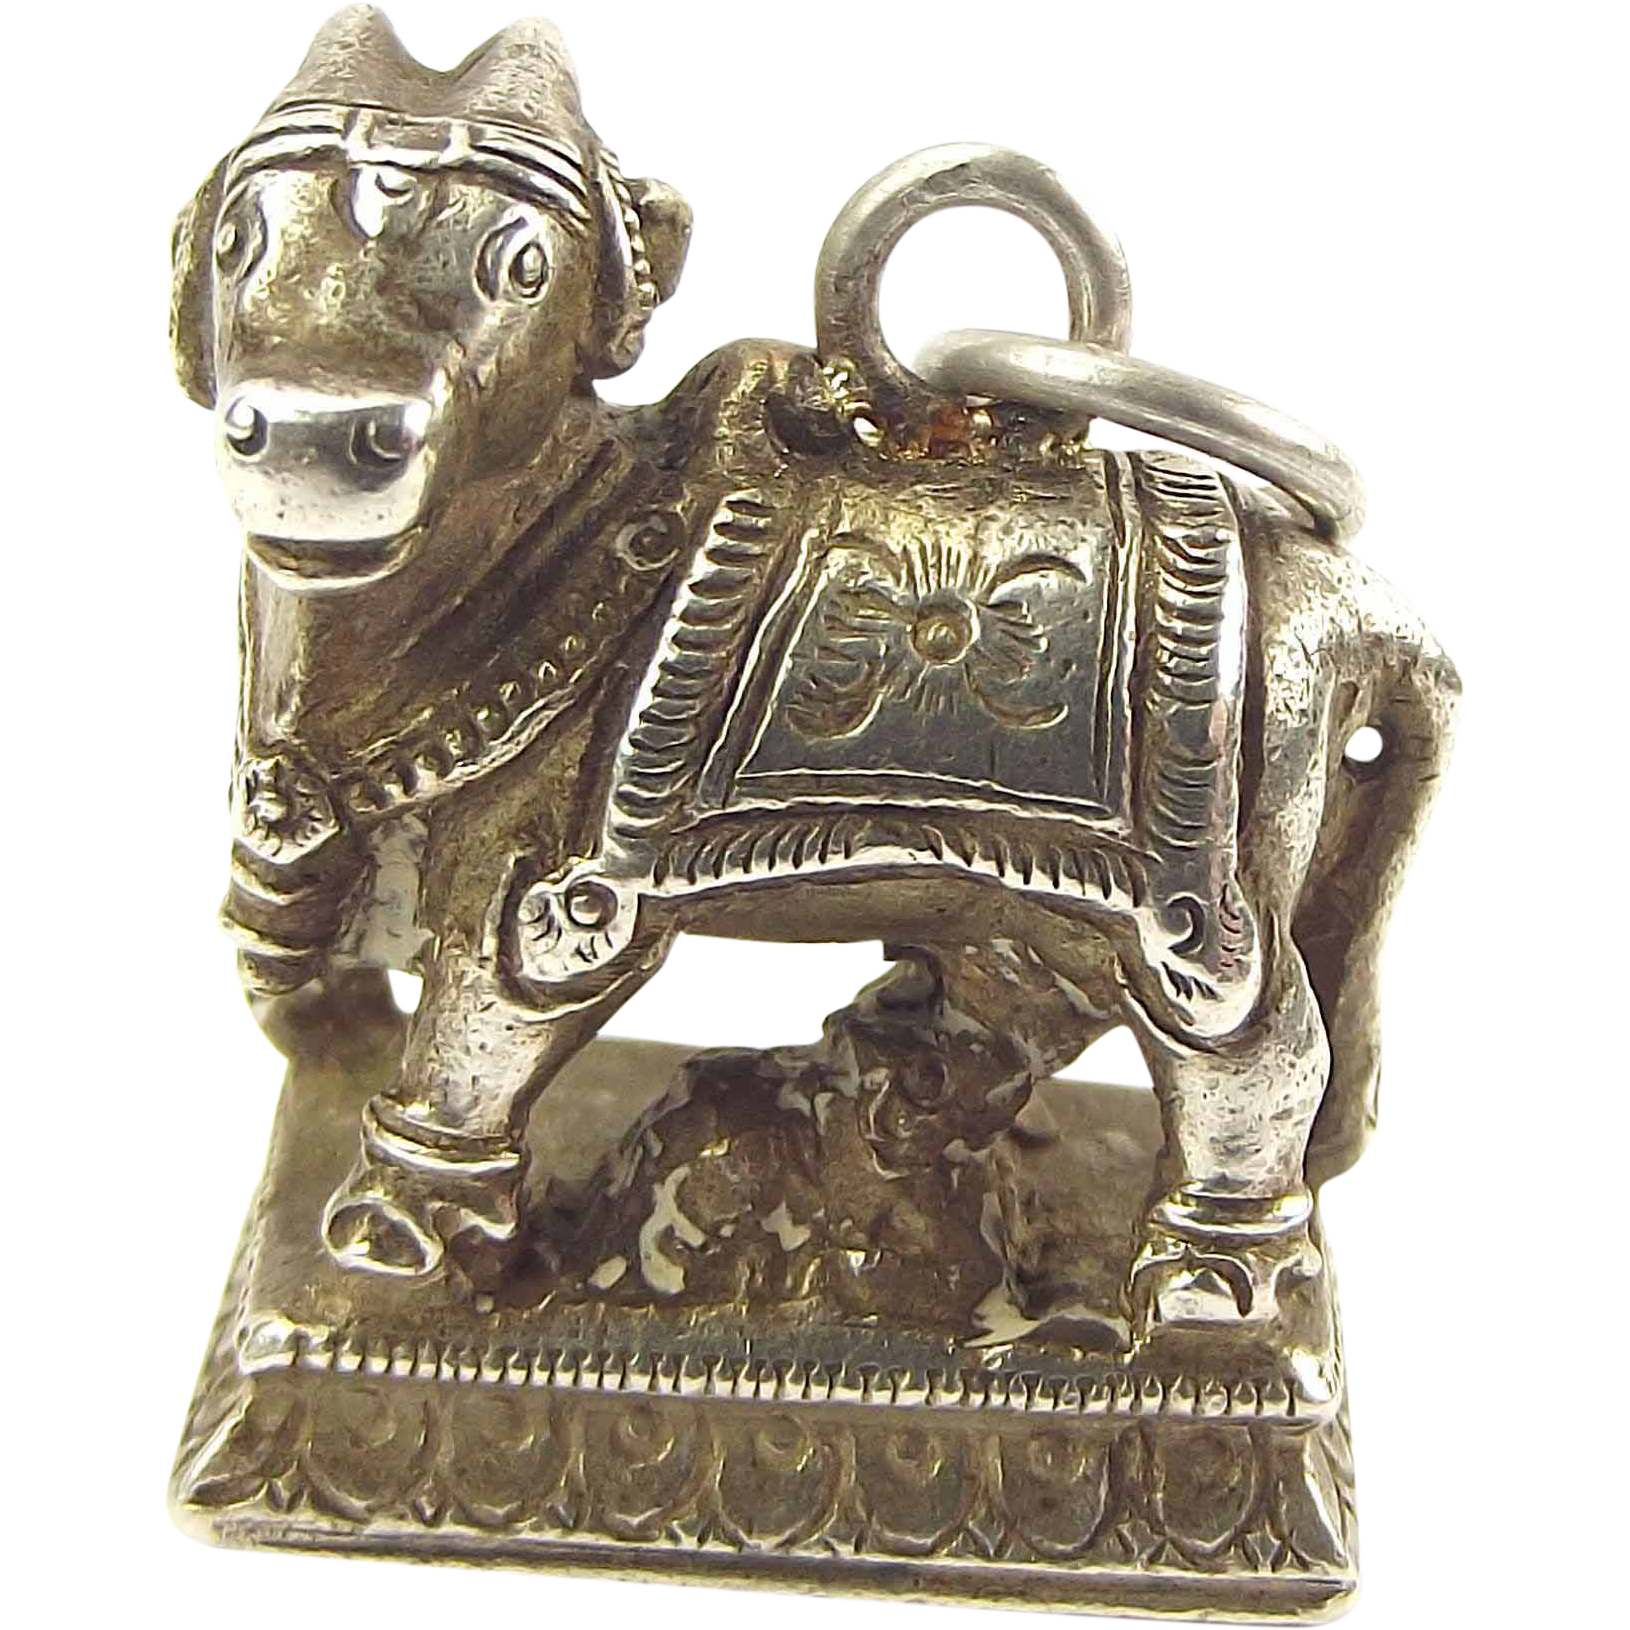 OOAK Antique Silver Charm Kamdhenu Divine Cow & Baby Calf Hindu God